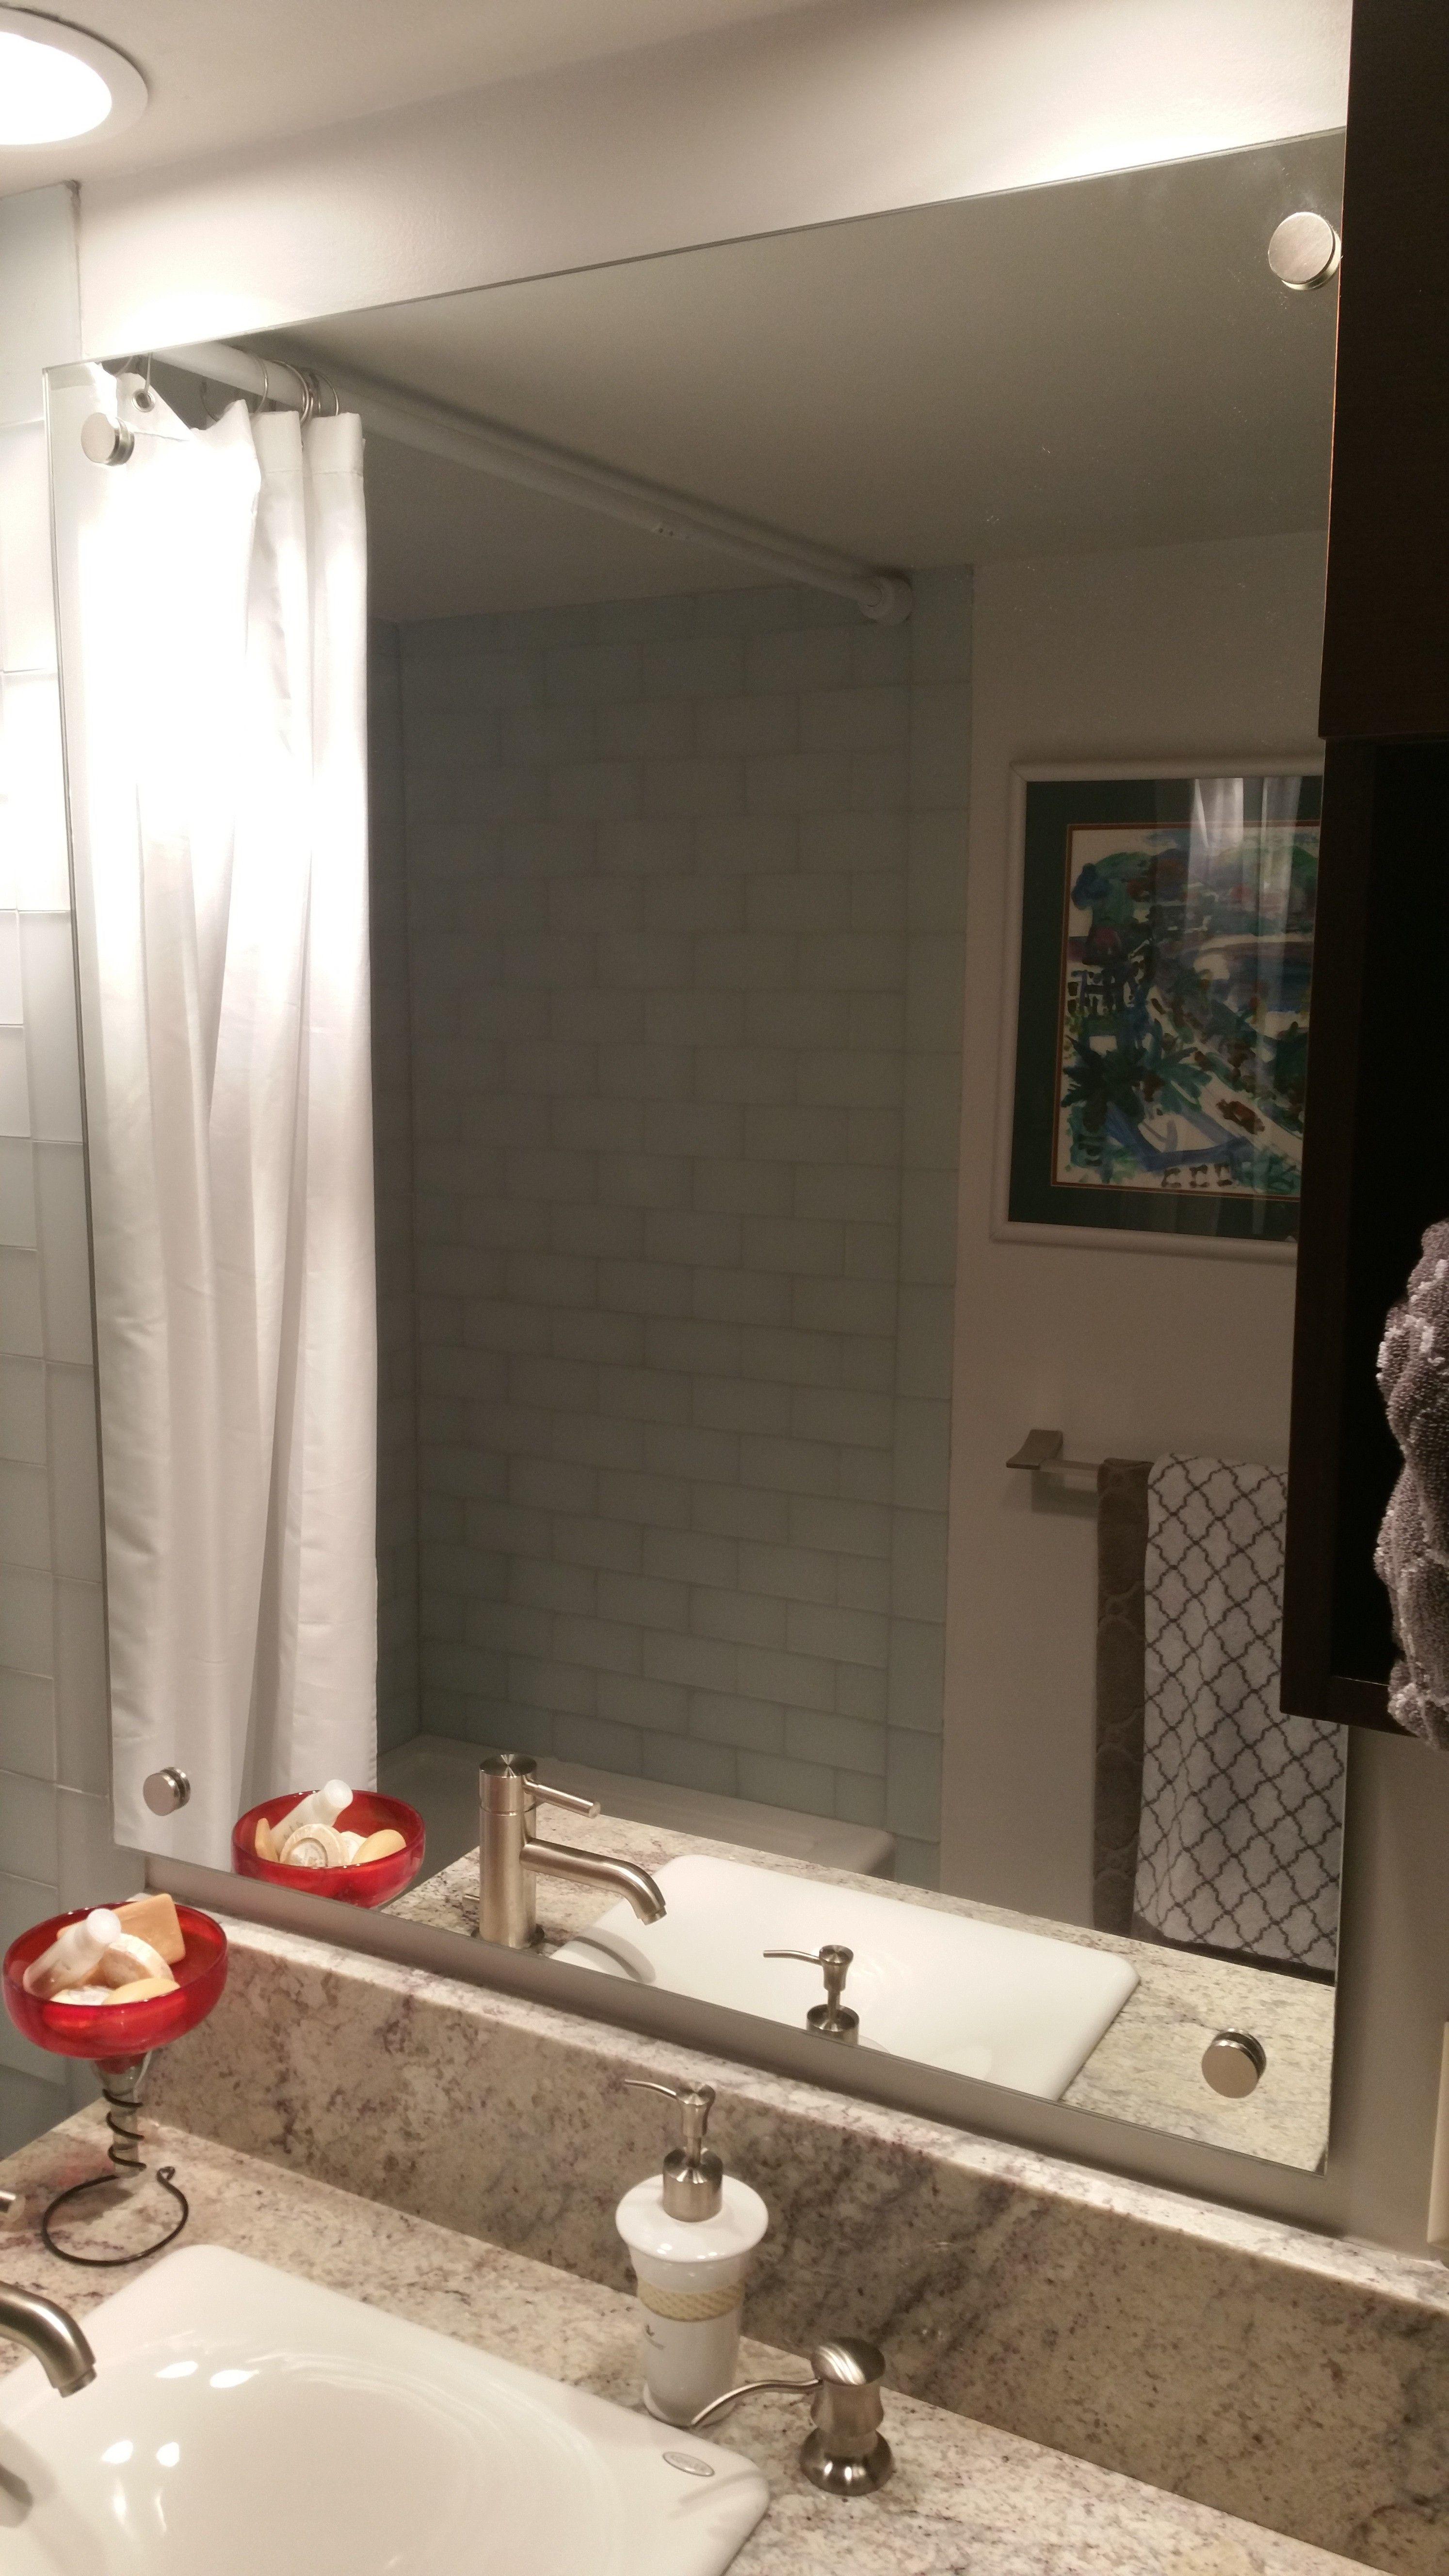 Bathroom Vanity Mirror with standoffs | Residential Glass ...